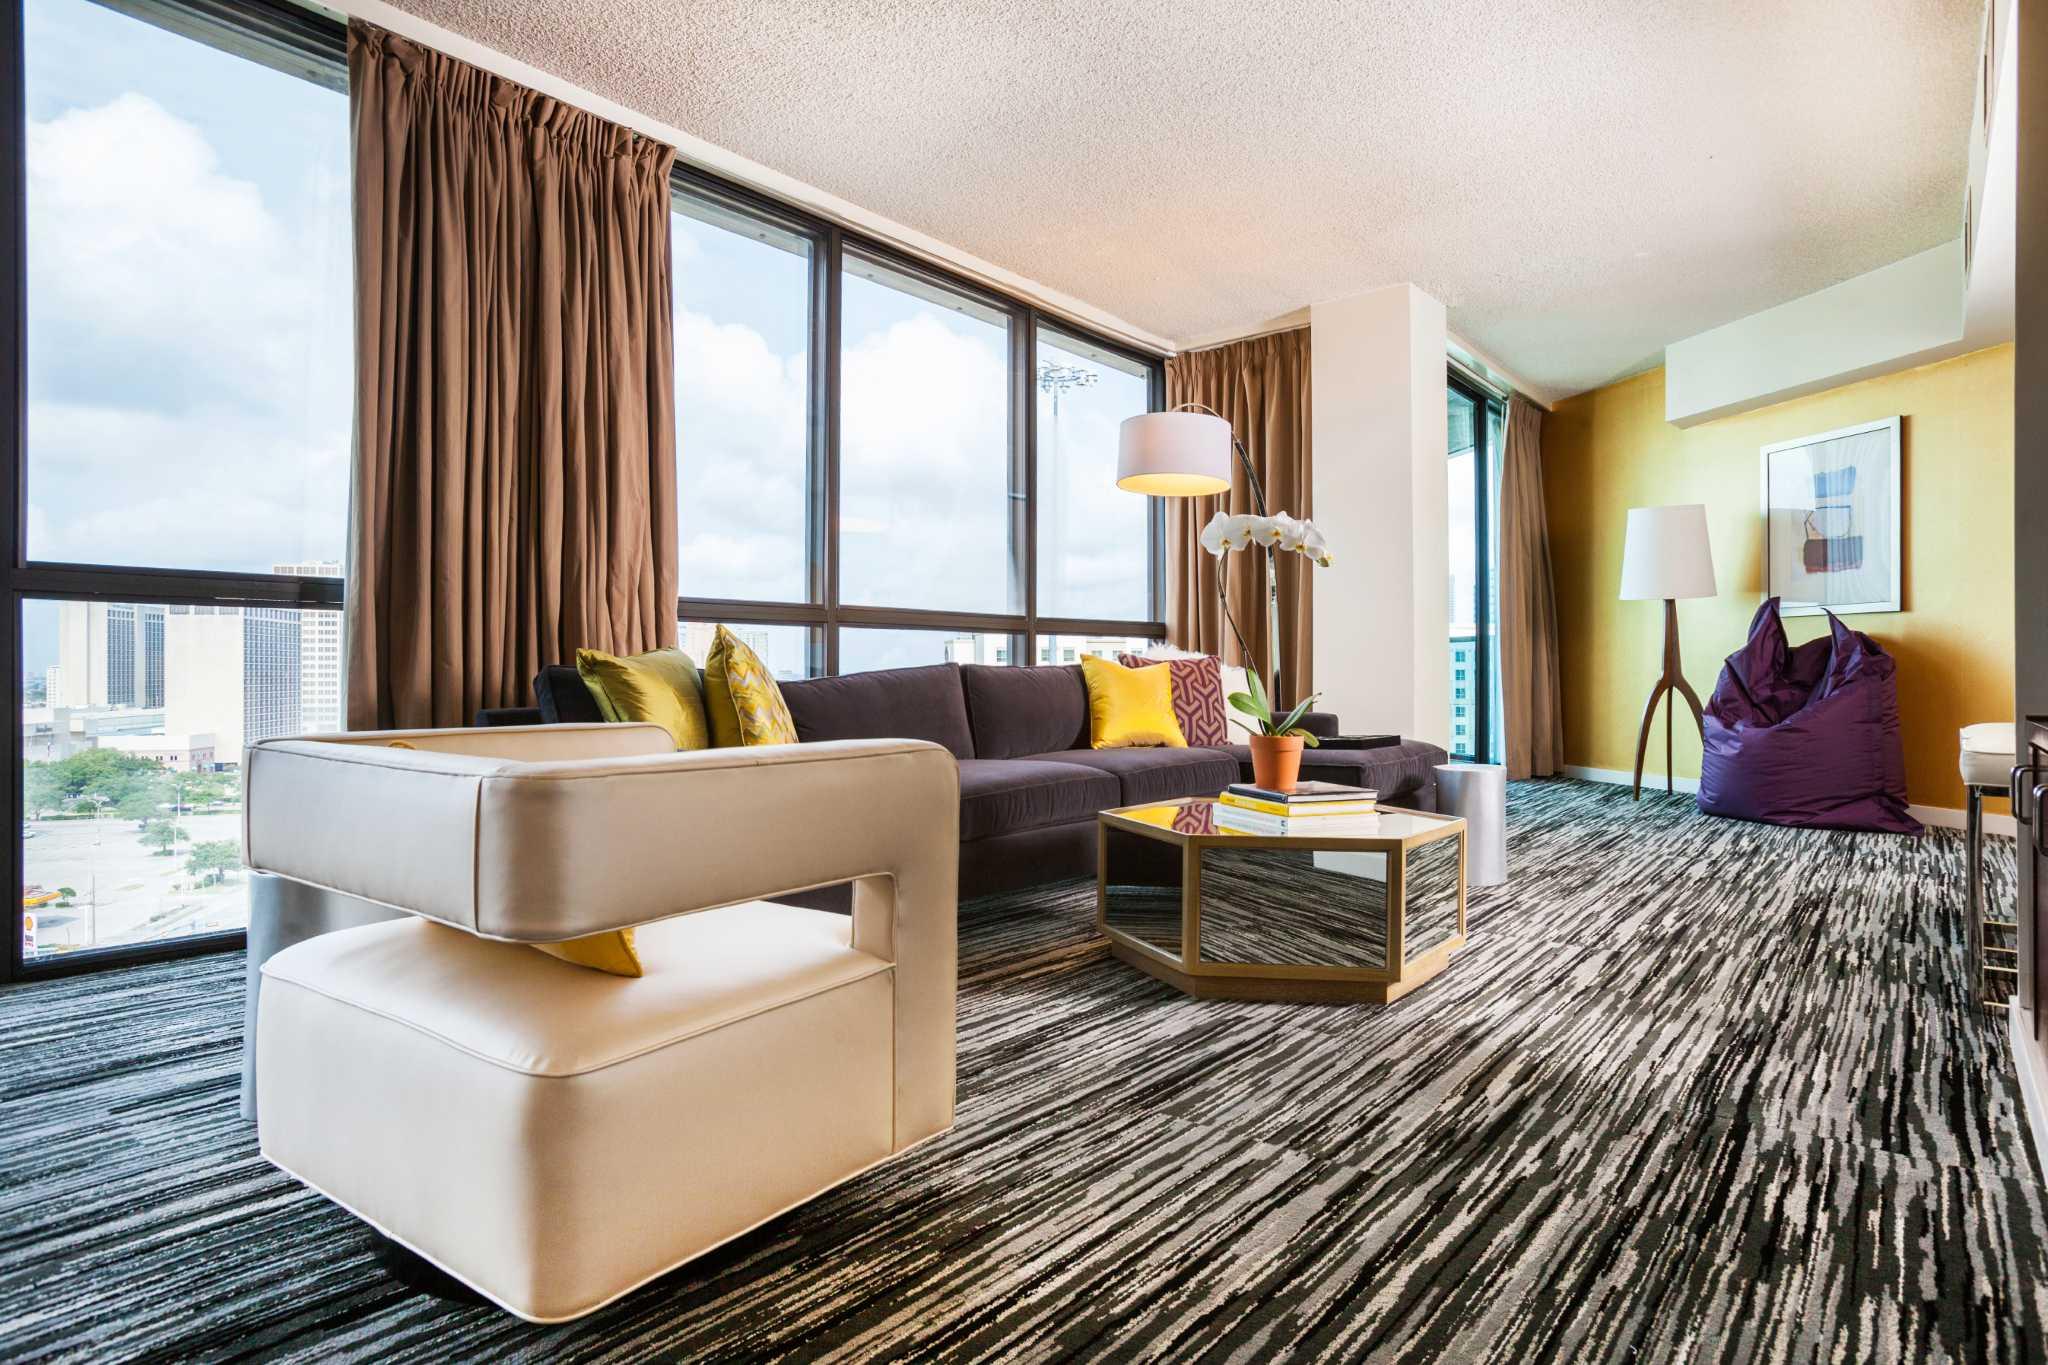 Houstons Poshest Hotel Suites